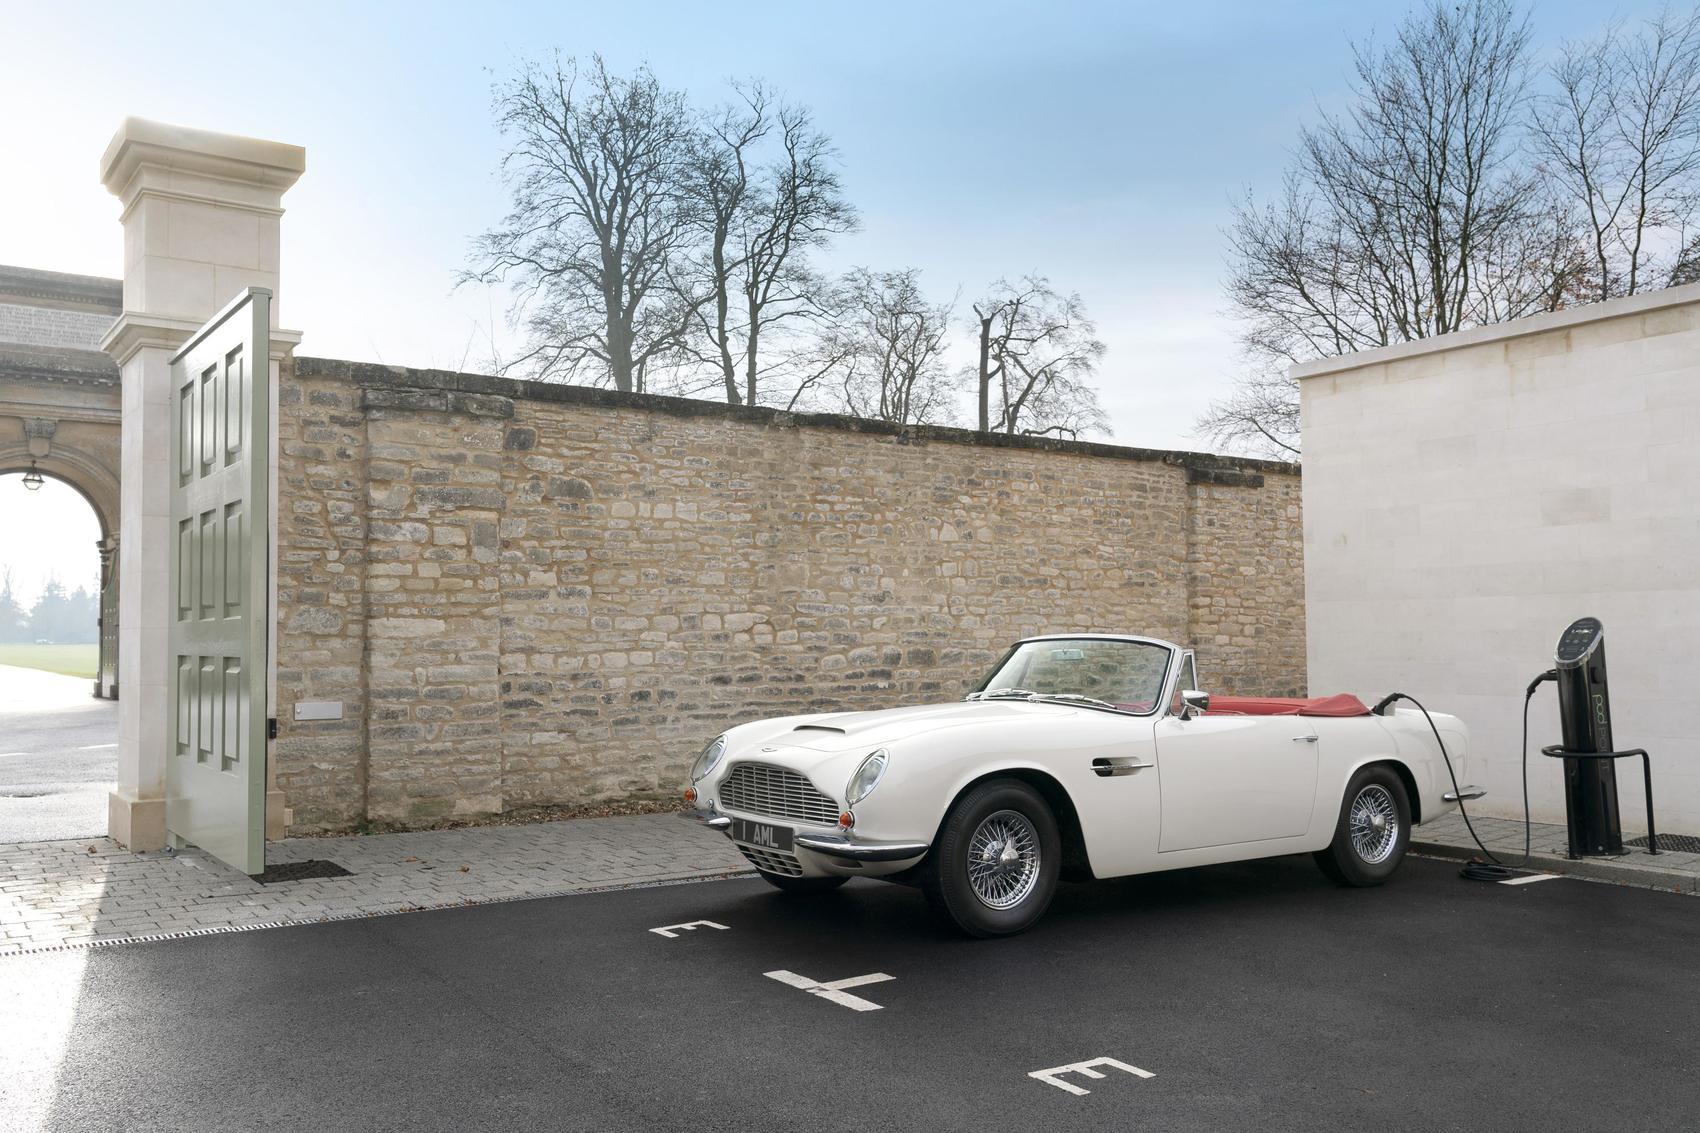 Would You Drive This Vintage Aston Martin EV?